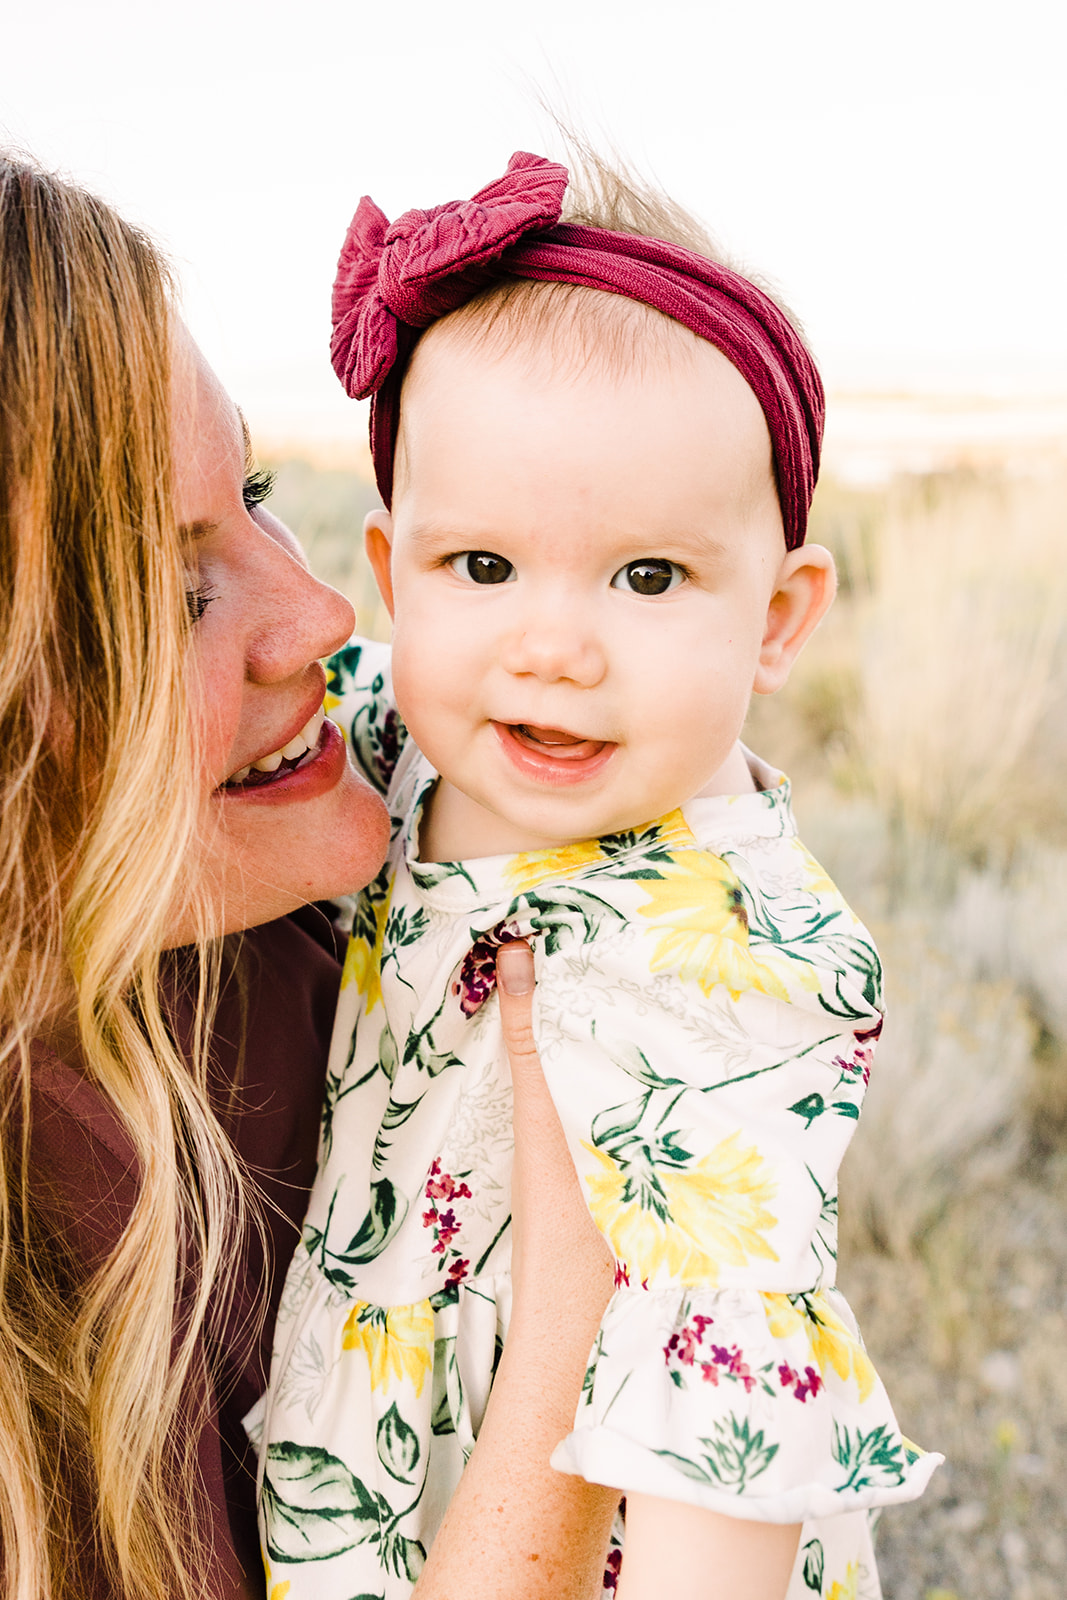 Utah family photos mini session, Kenzie Jo Photography, Utah family photographer